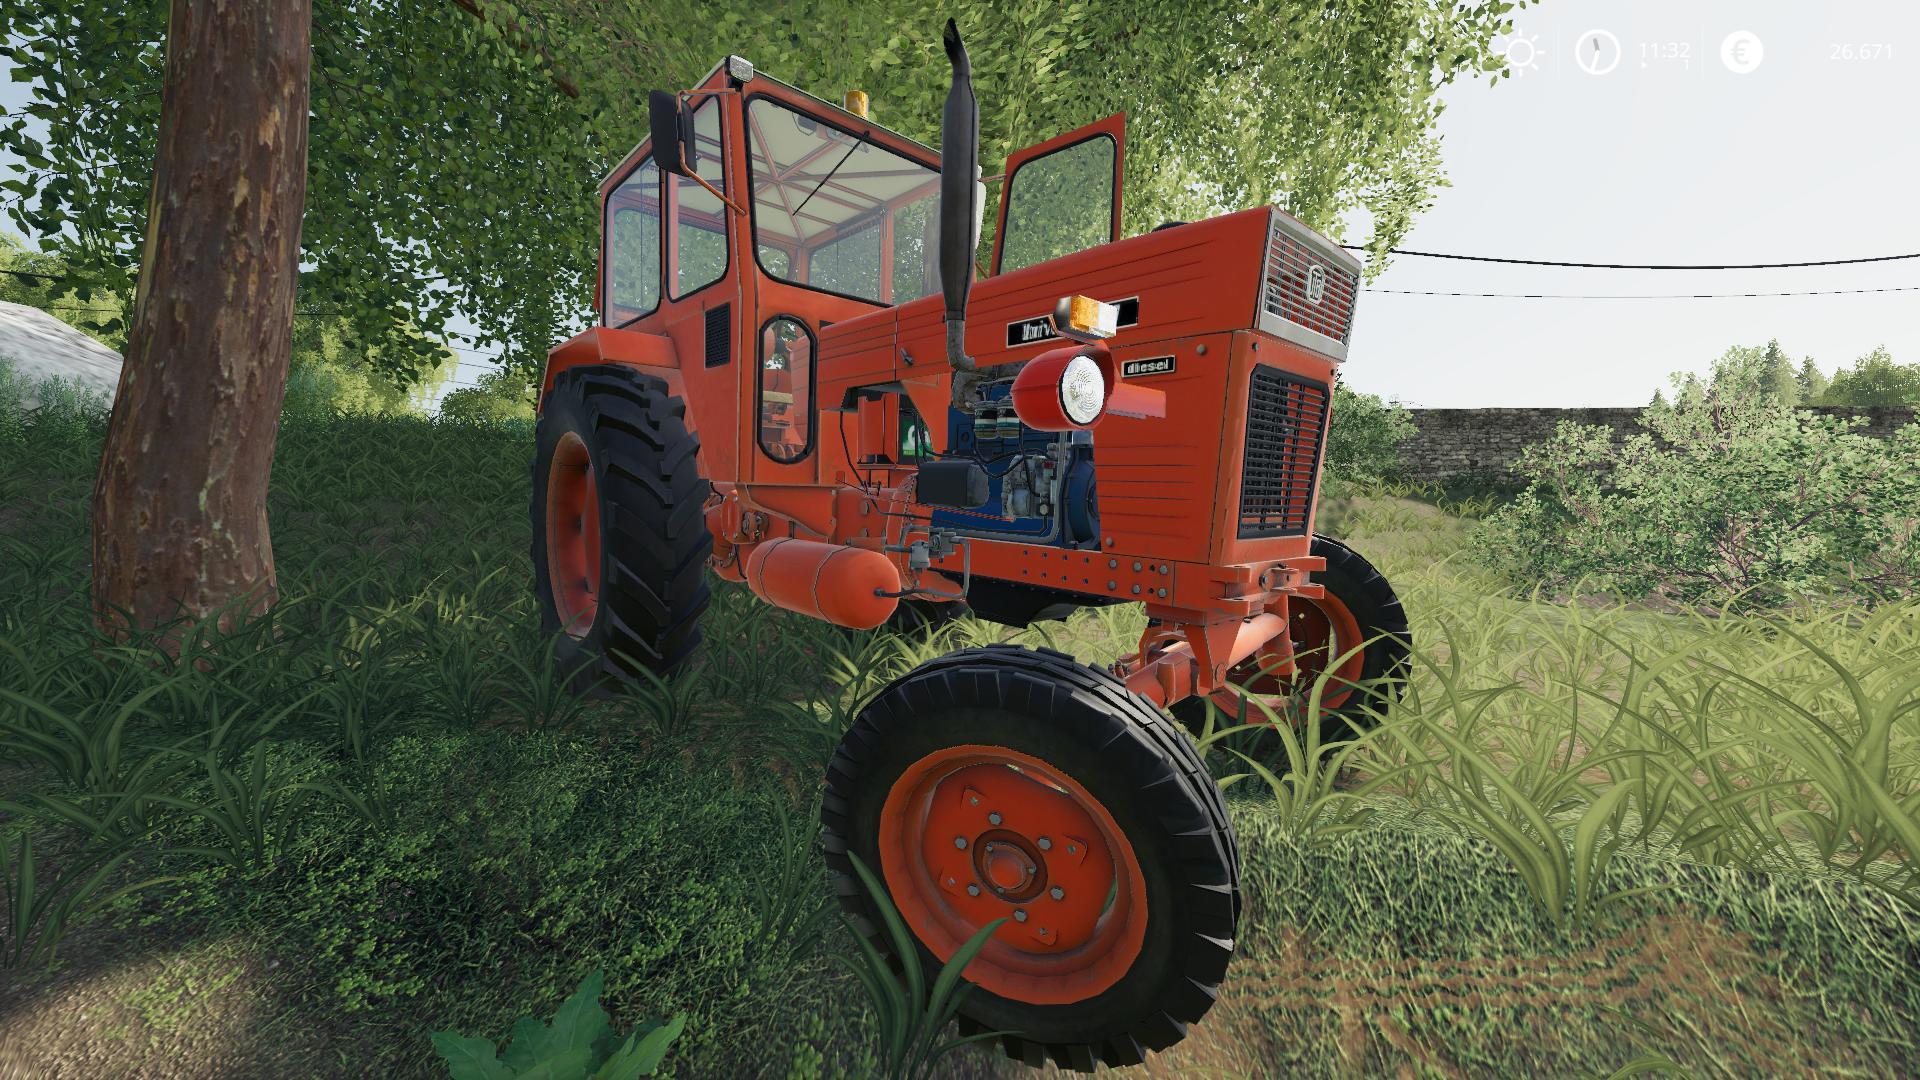 Universal 650 Special 1 0 0 0 Tractor FS 19 - Farming simulator 17